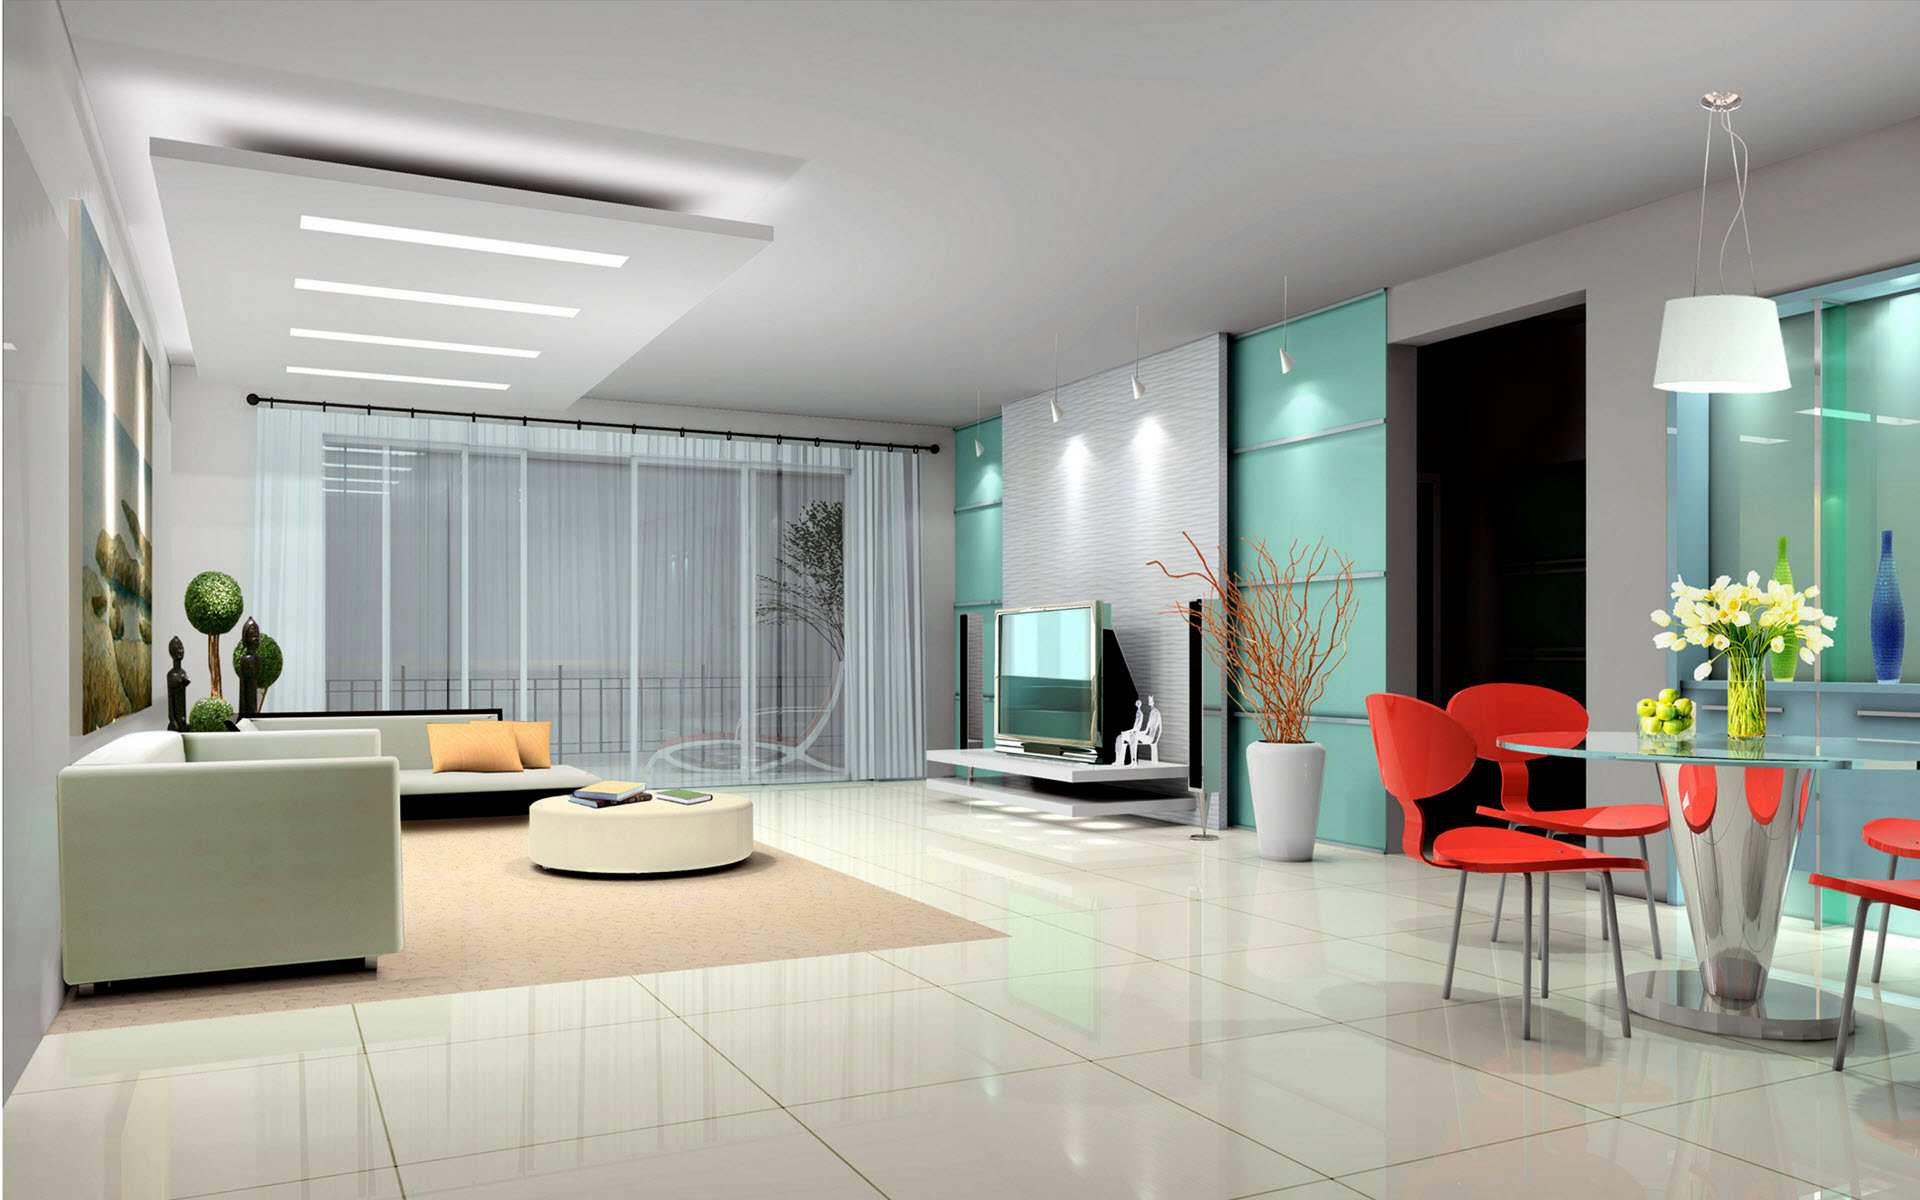 new interior design idea